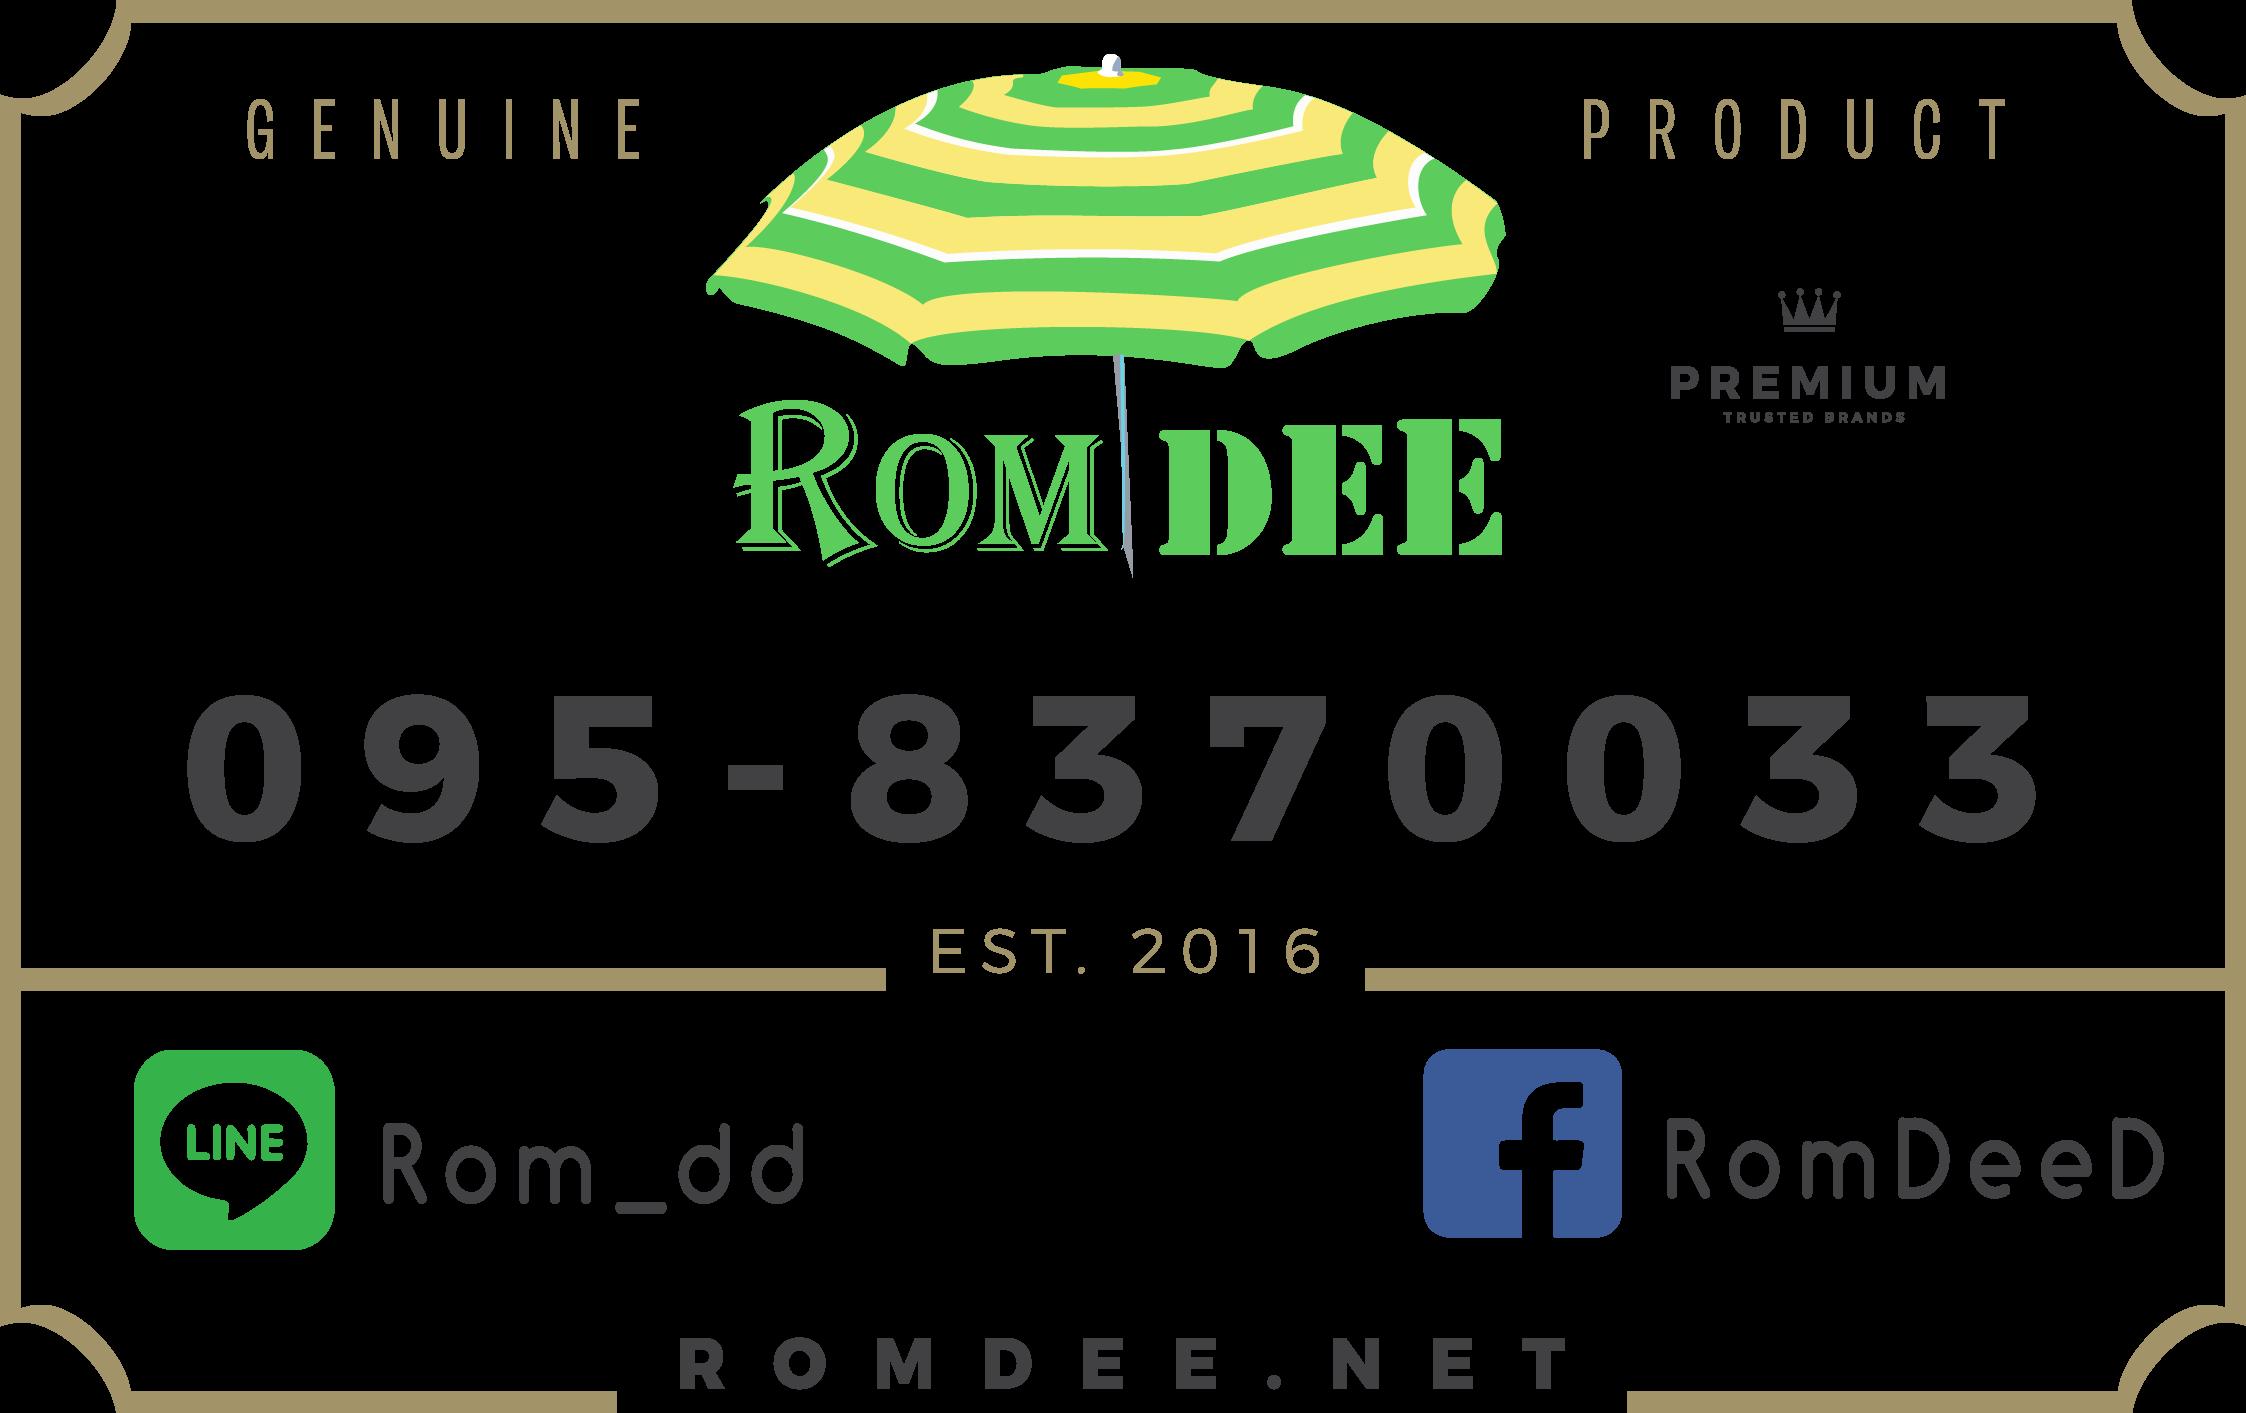 Romdee's Badge - Geniune Product